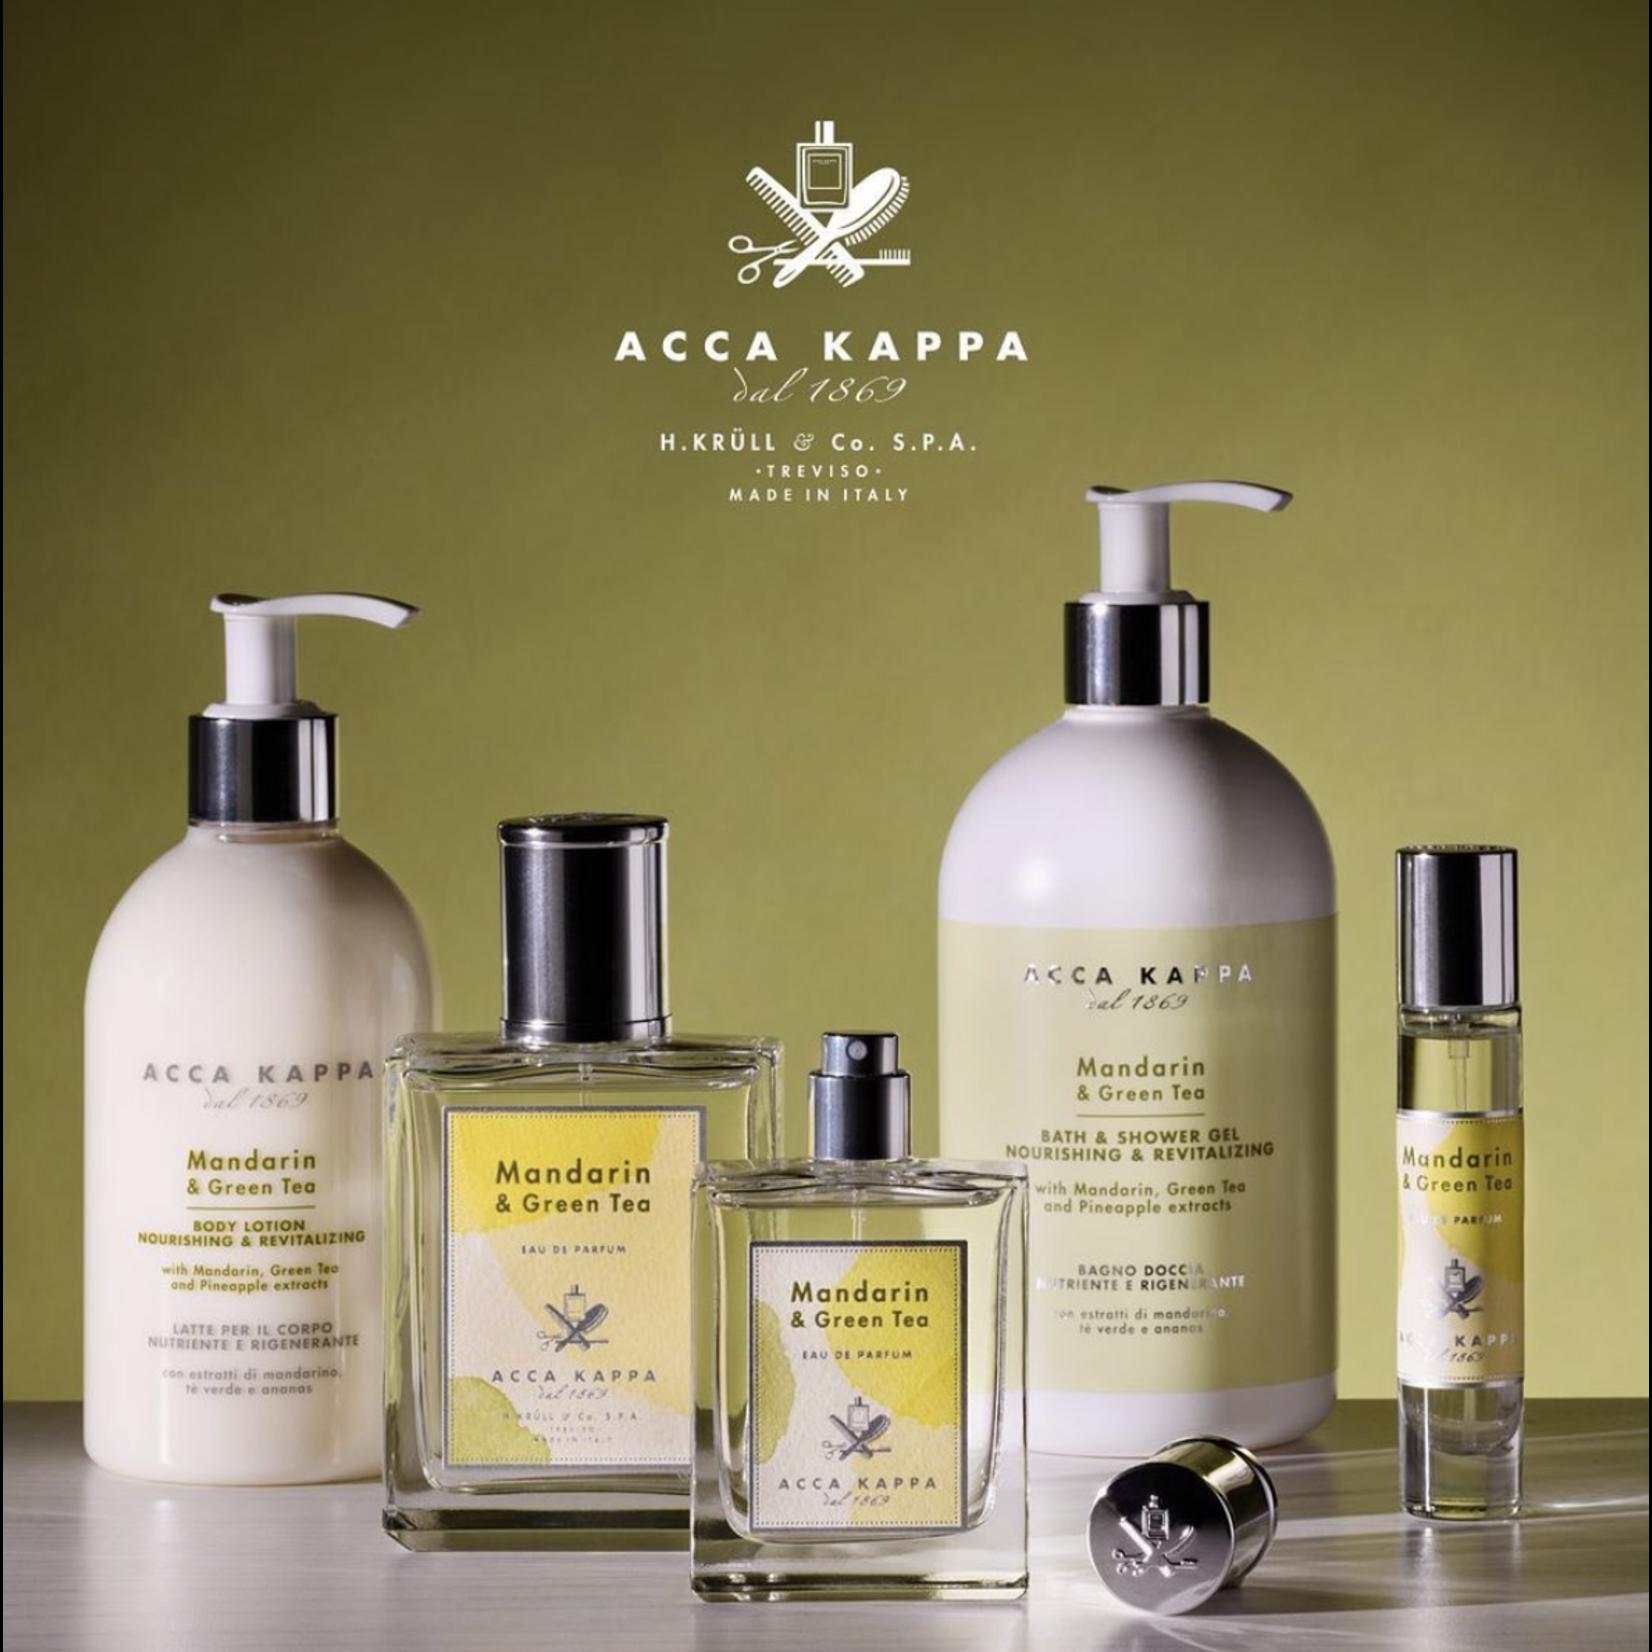 ACCA KAPPA ACCA KAPPA · MANDARIN & GREEN TEA BODY LOTION 300ML